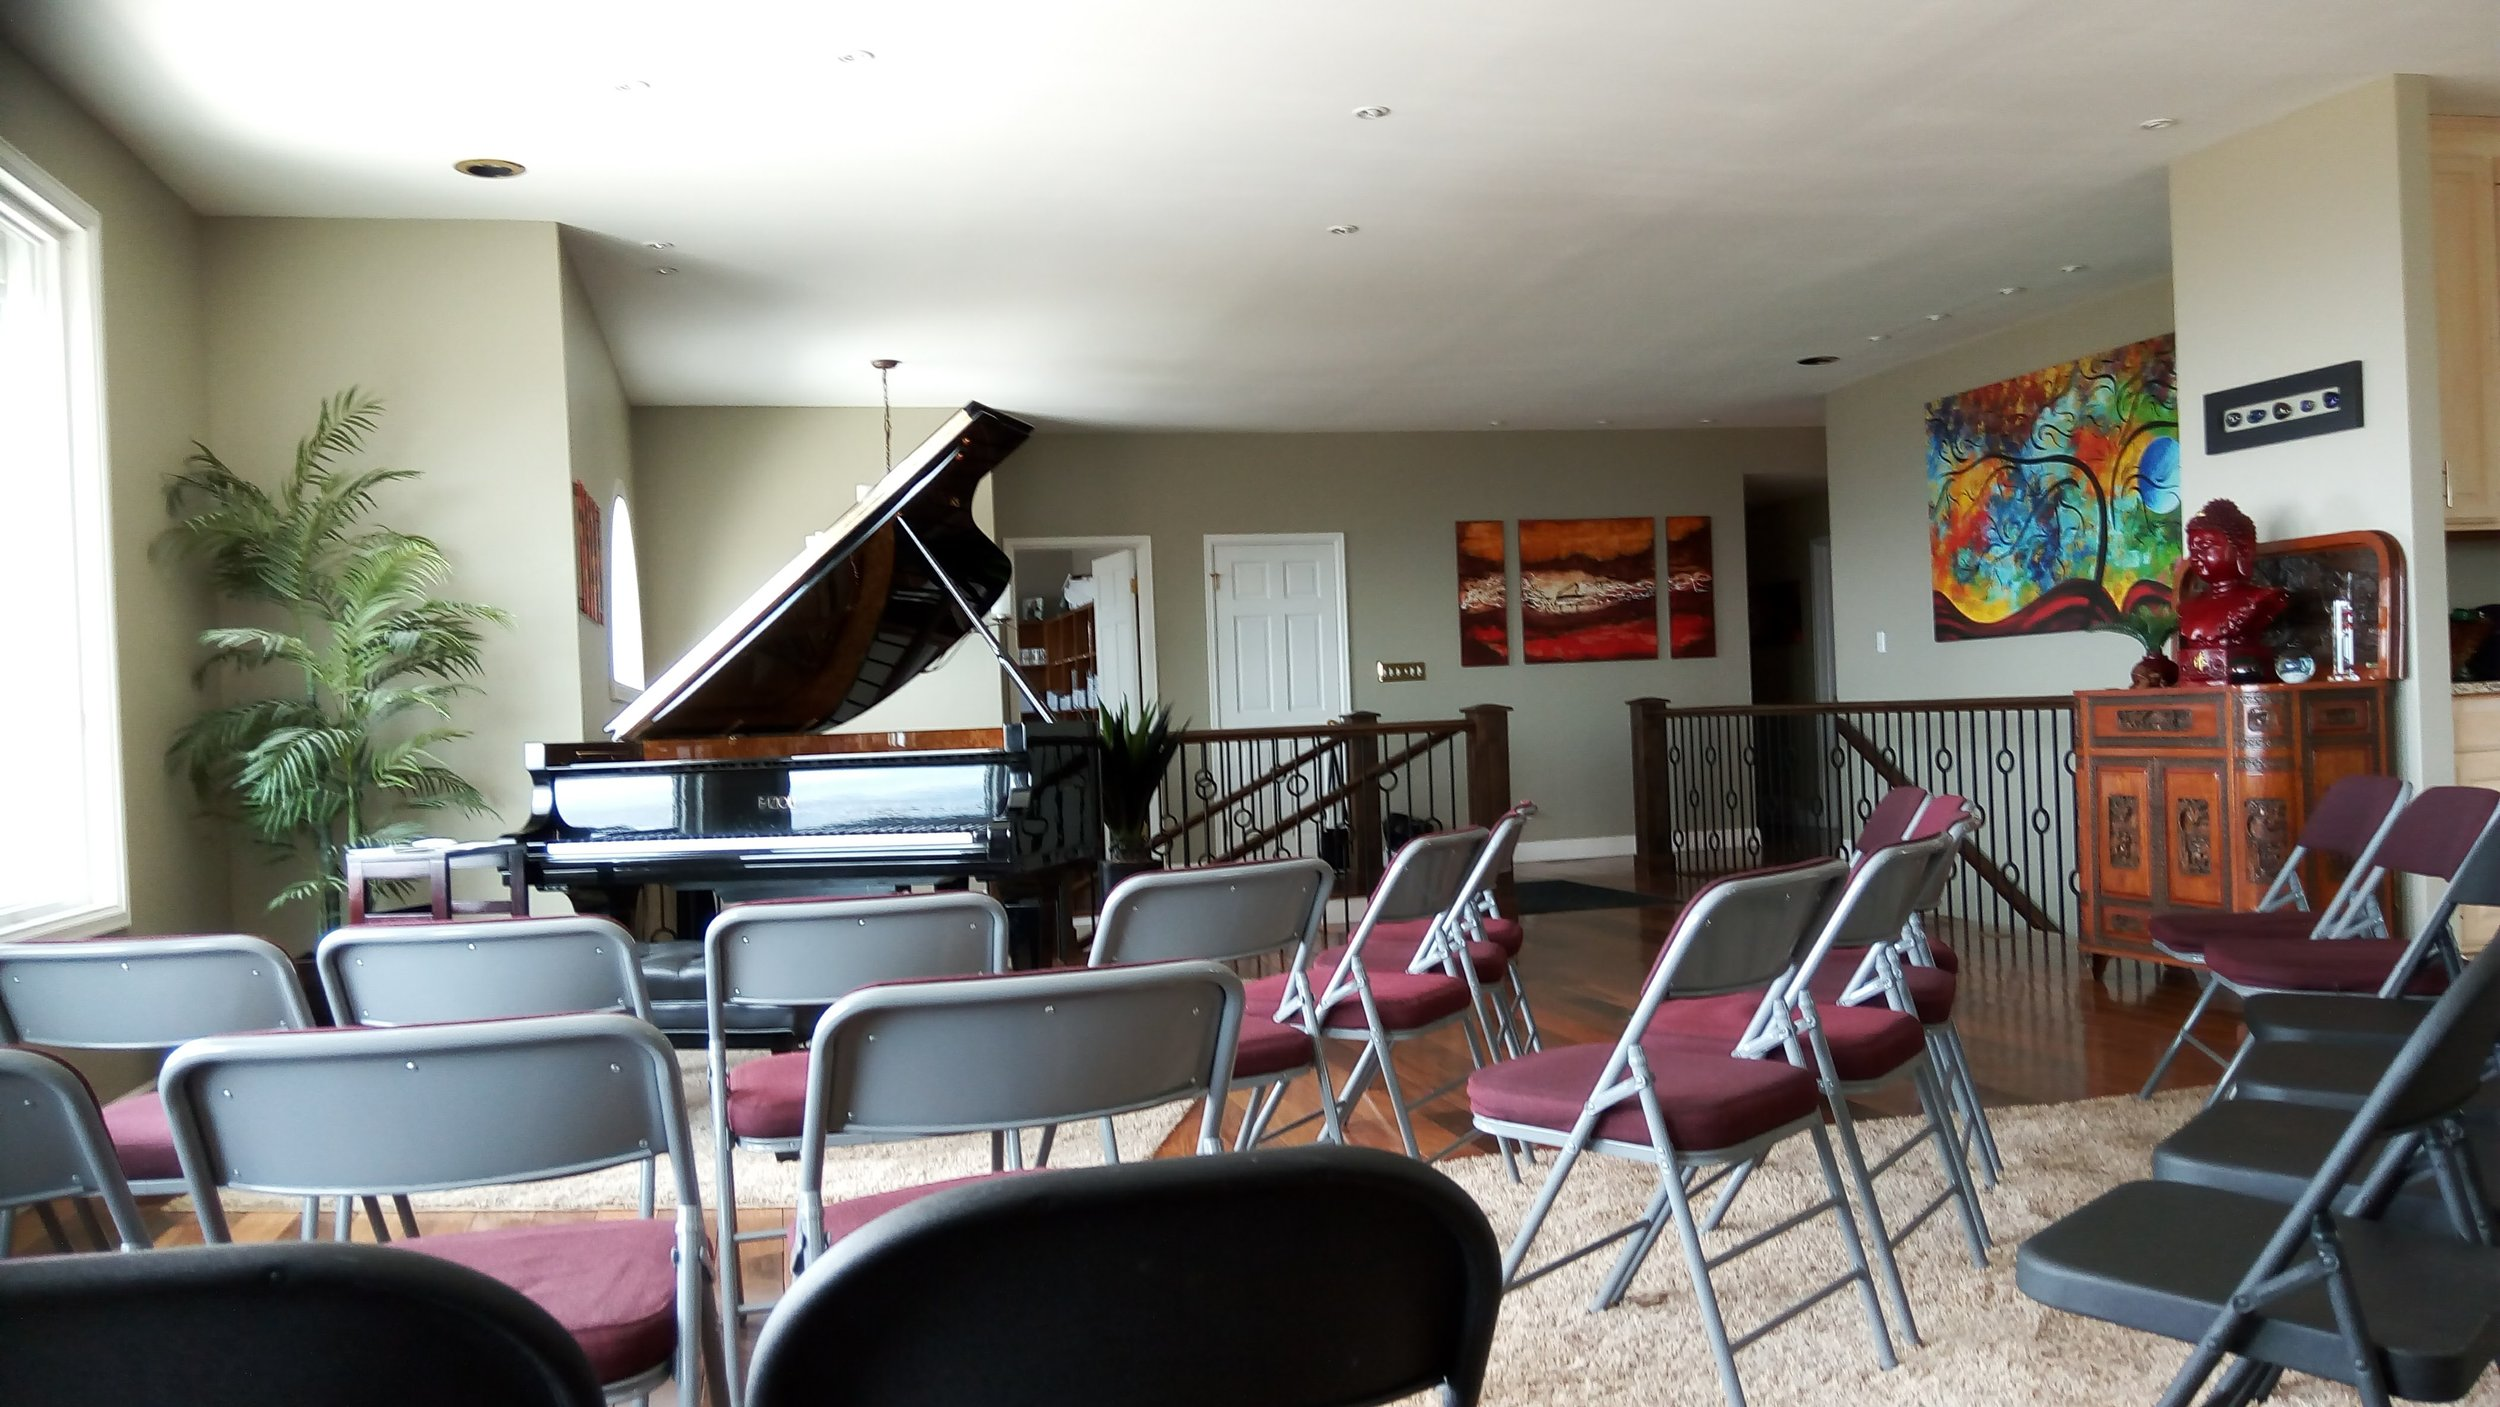 The Concert Space - beautiful Fazioli piano